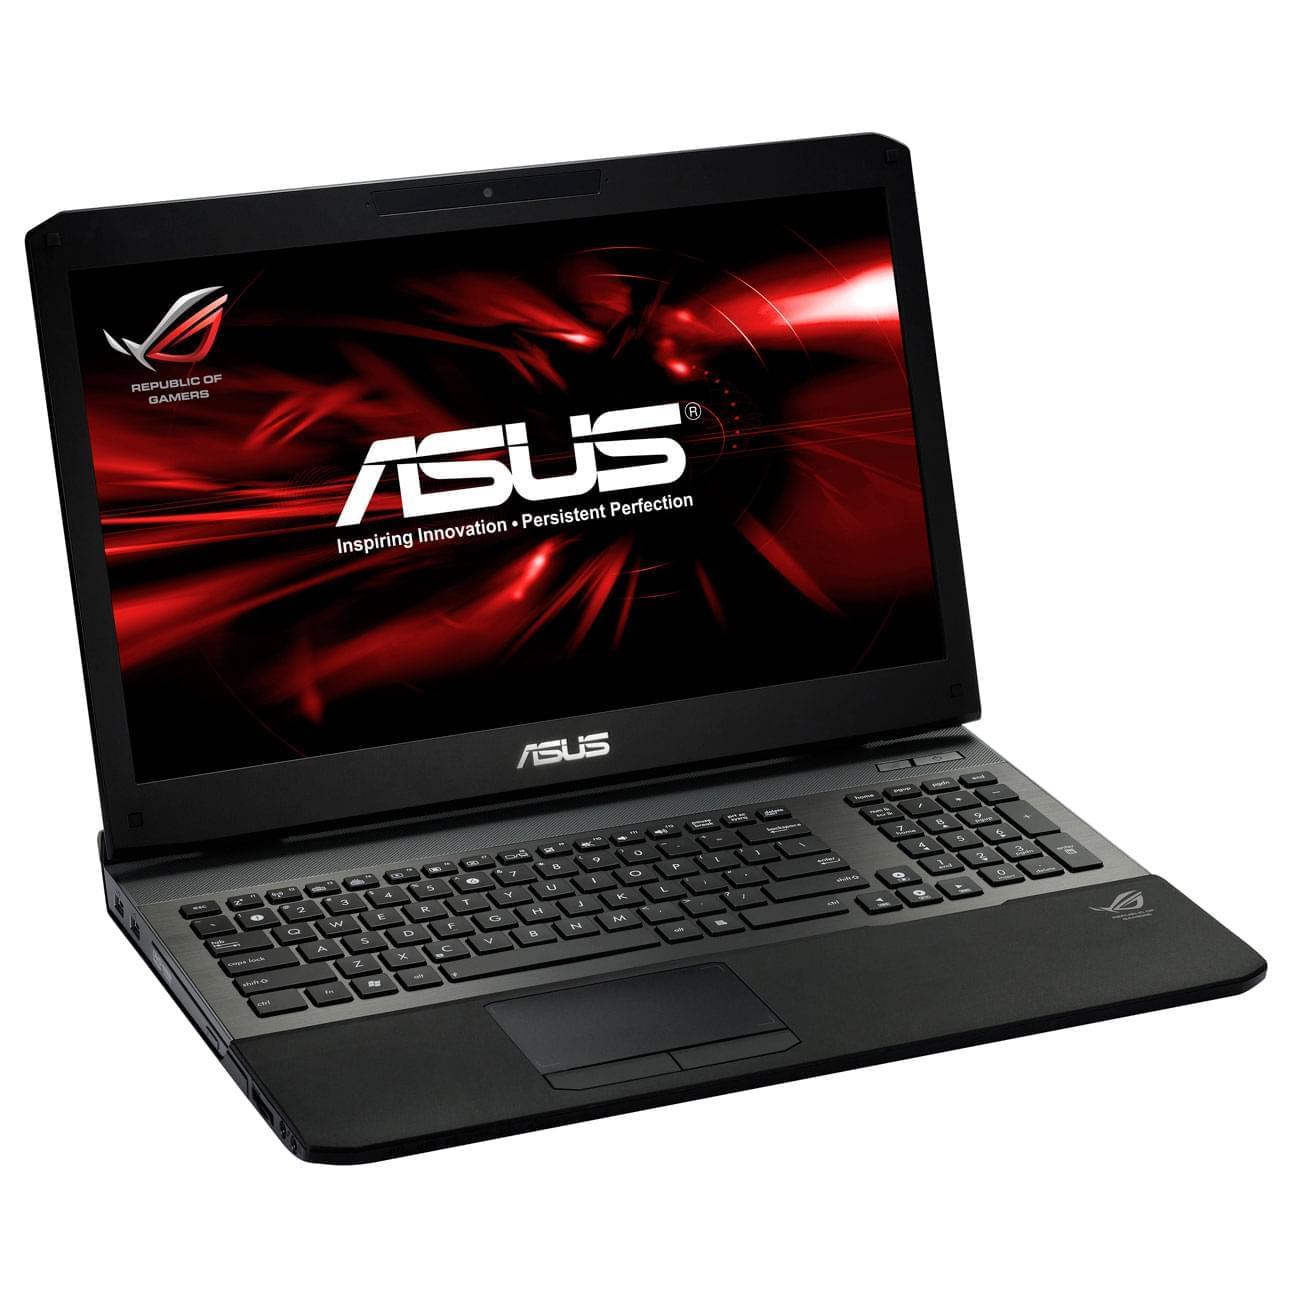 Asus G75VX-CV122H - PC portable Asus - Cybertek.fr - 0